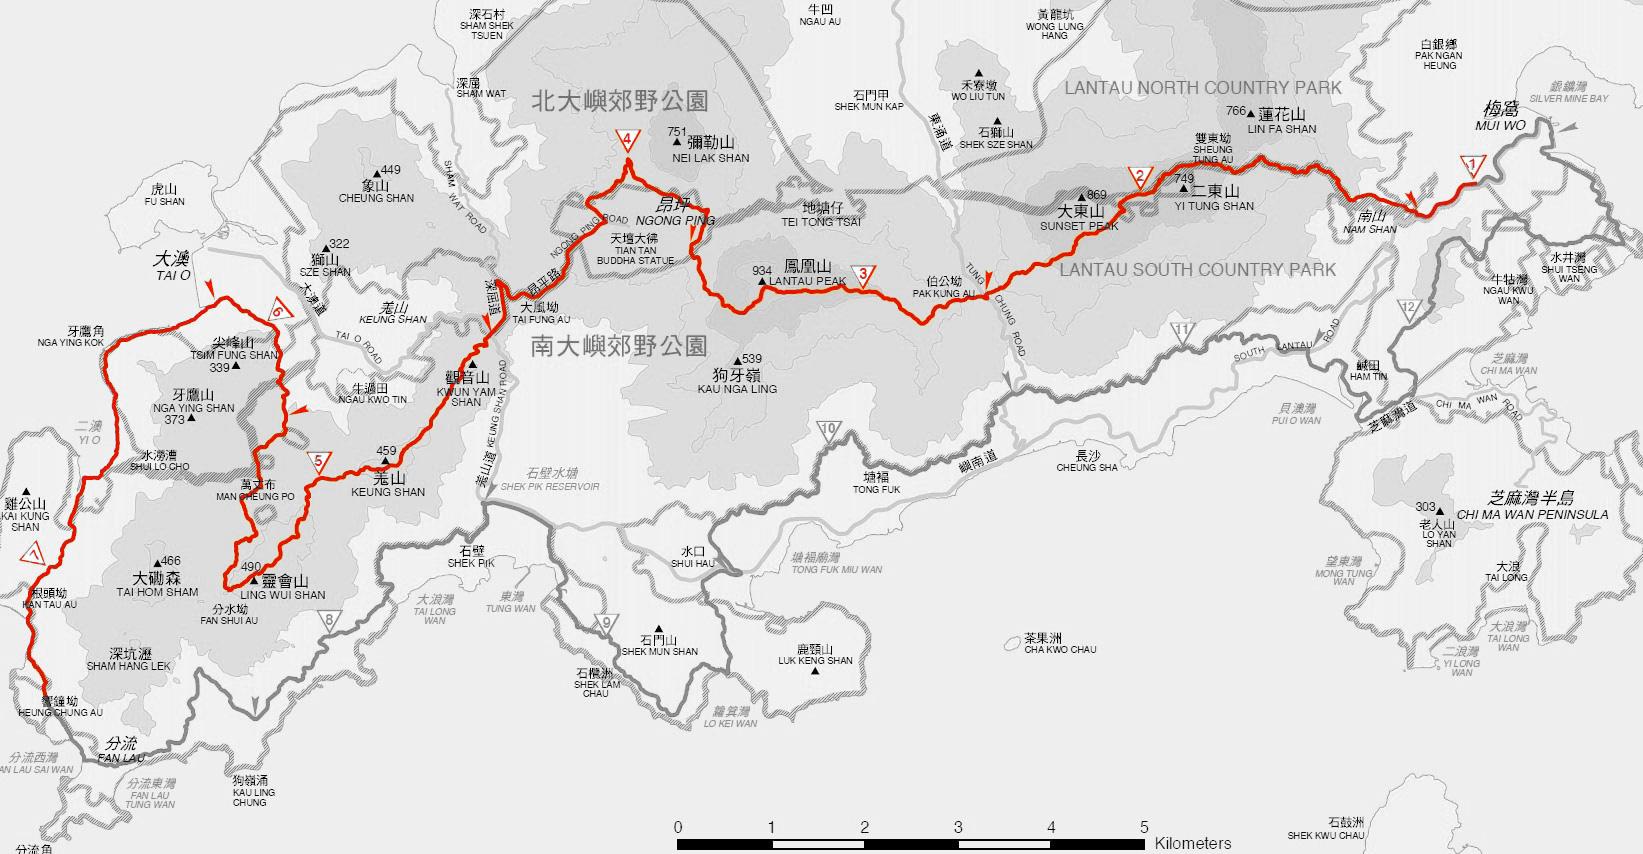 lt-map-1